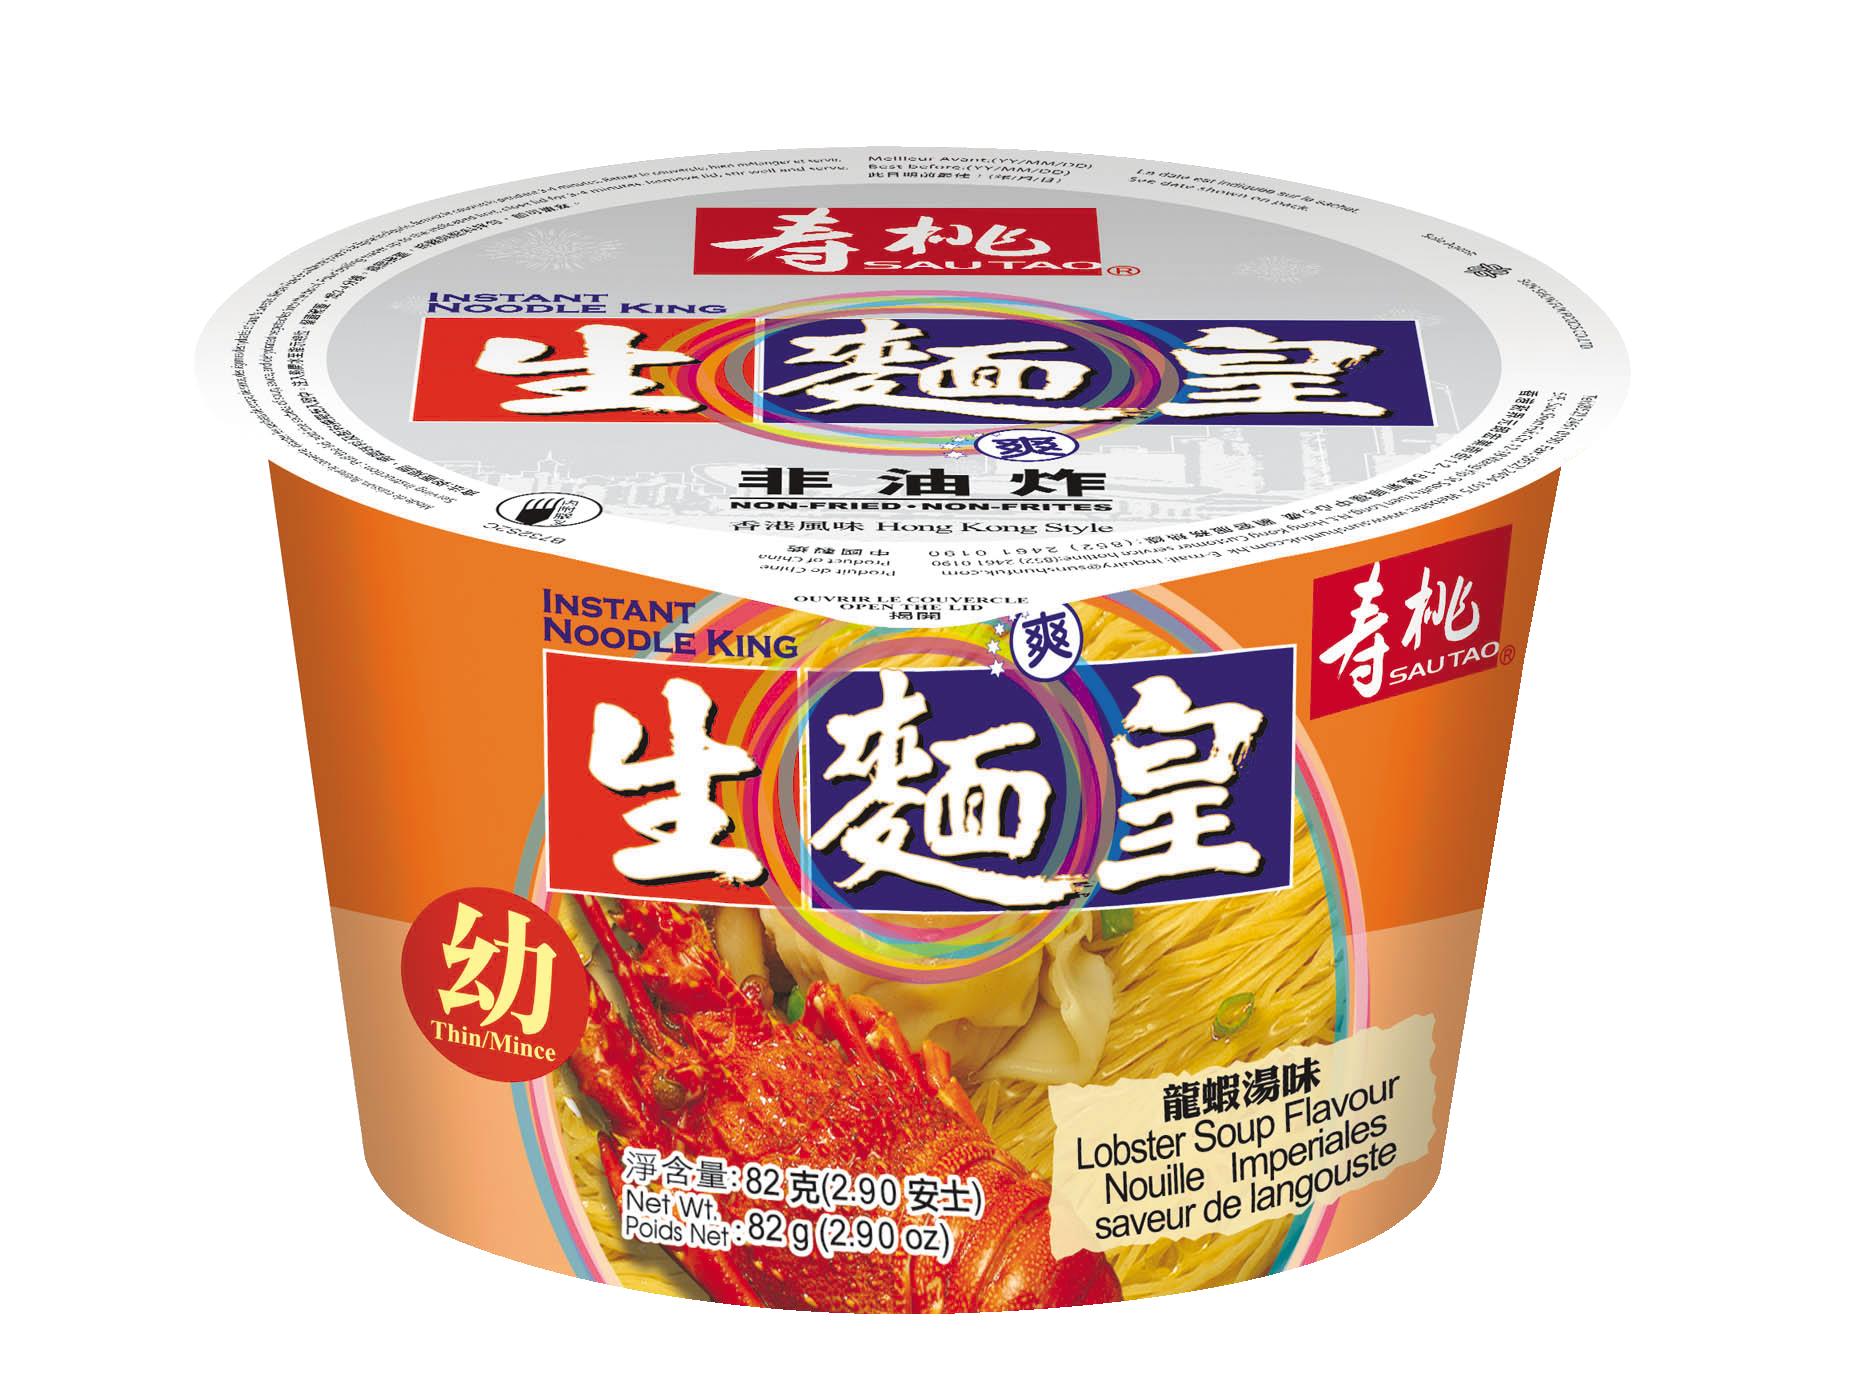 Nouille saveur langouste, Sau Tao (75 g)